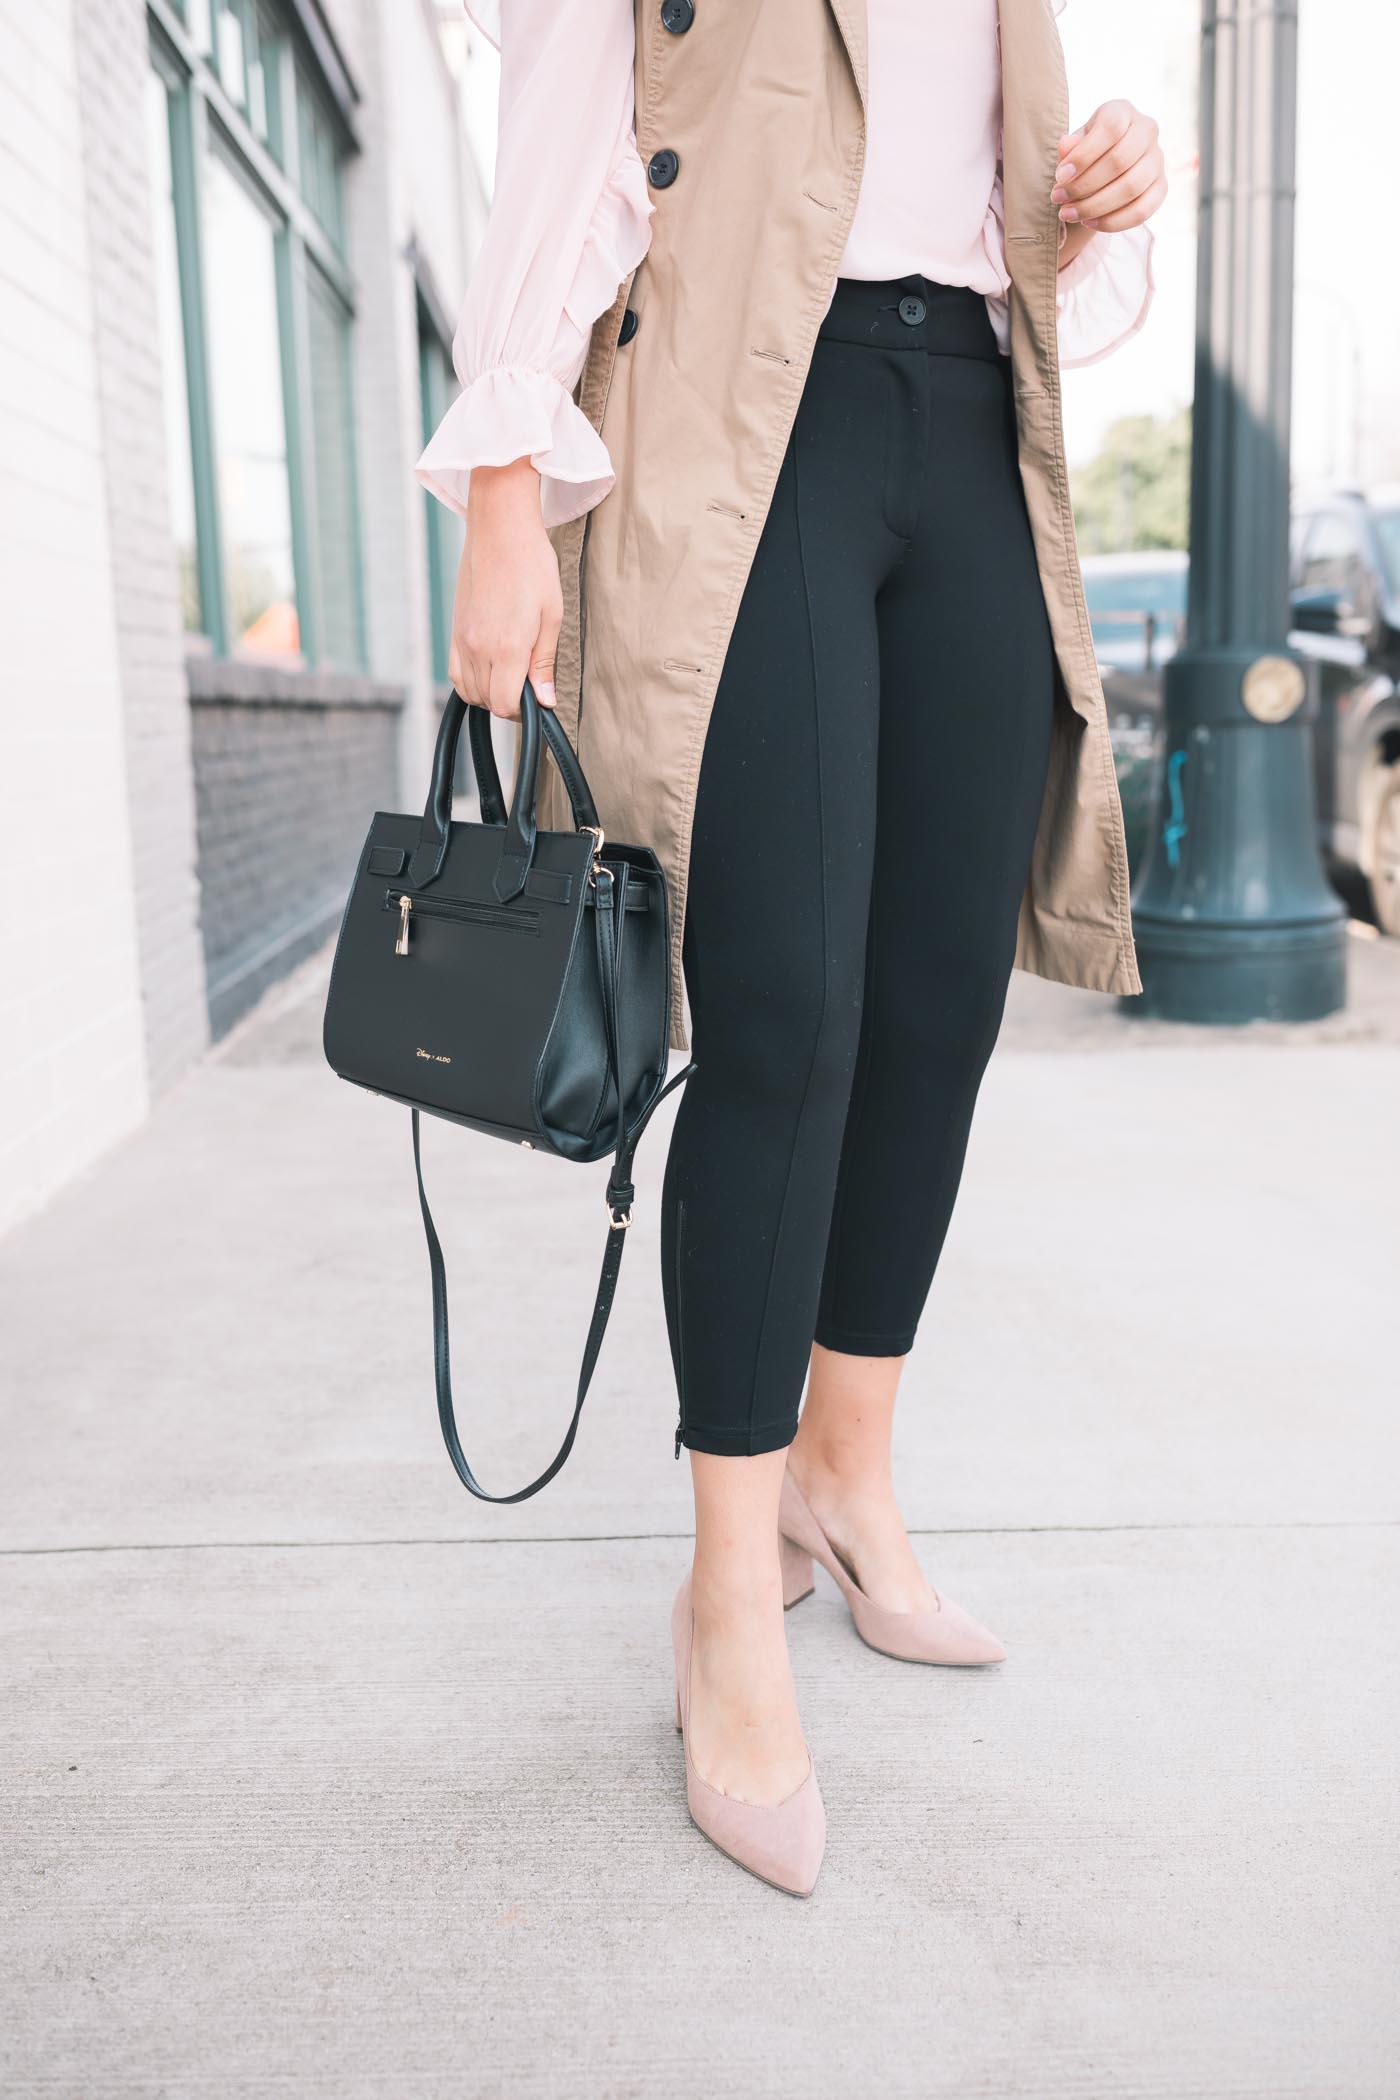 Pink Ruffle Blouse, trench Vest, Black Dress Pants, Black Bag